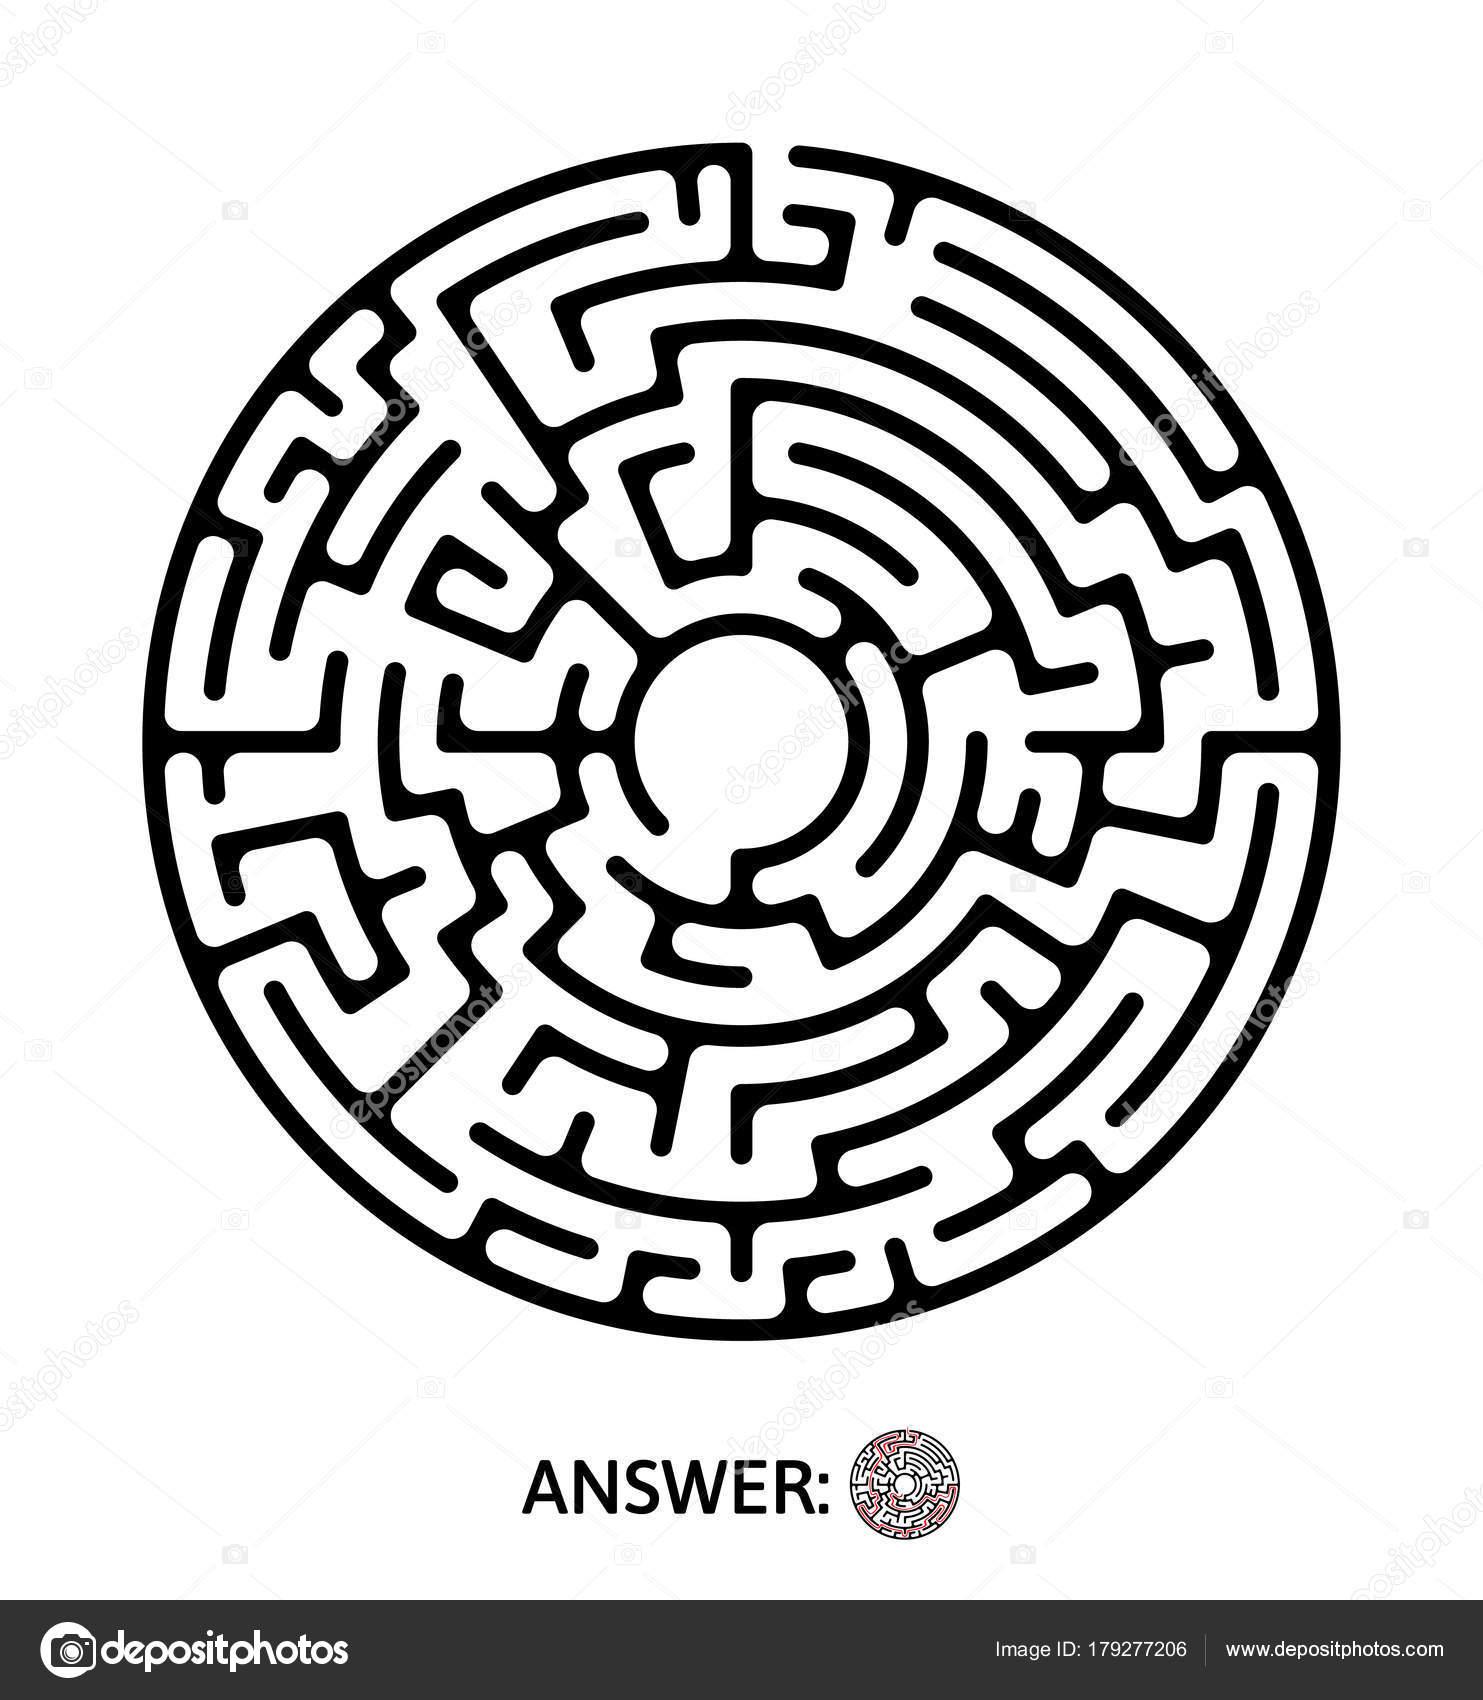 Black Round Maze Puzzle Game Vector Labyrinth Illustration